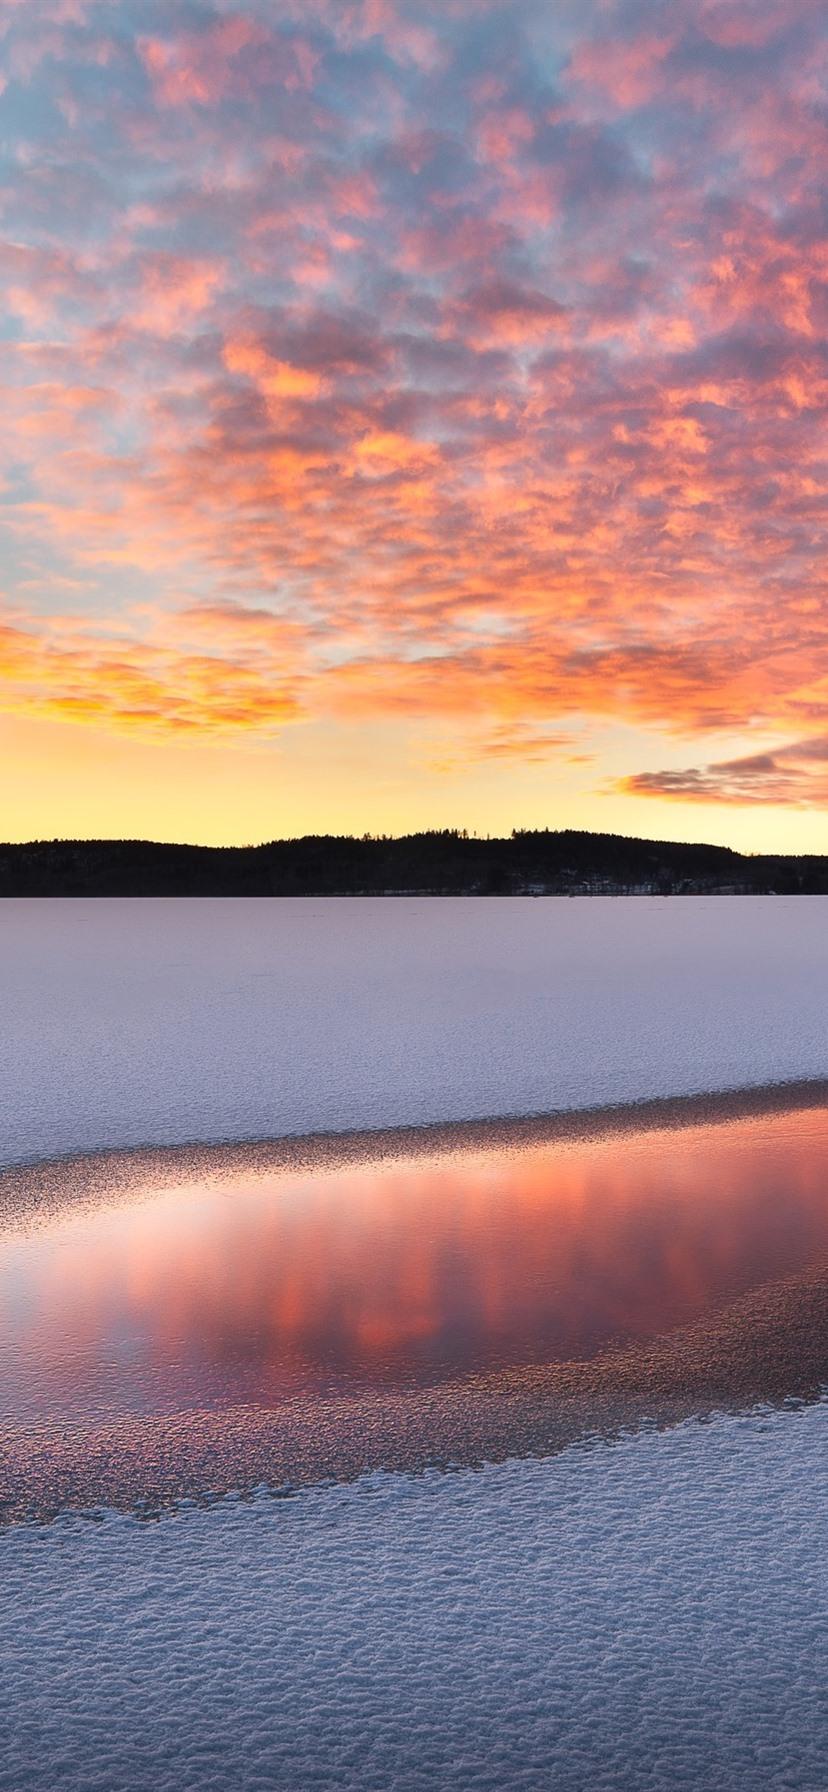 Winter See Schnee Wasser Sonnenuntergang 828x1792 Iphone